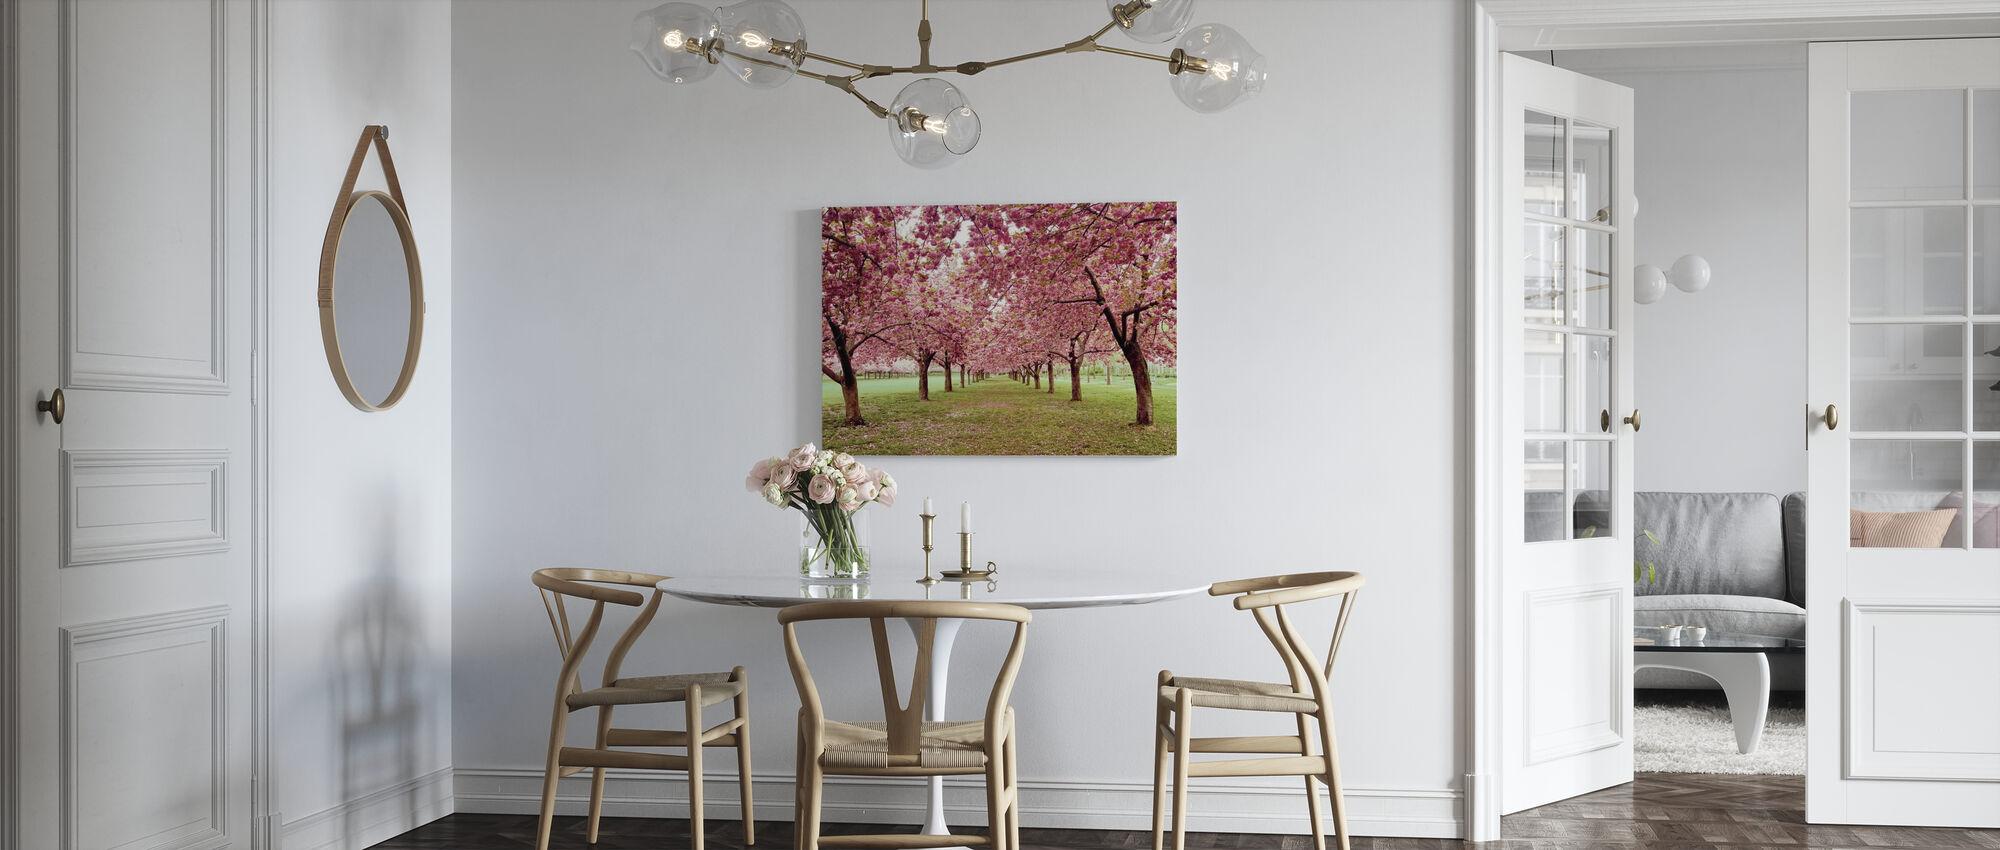 Hall of Cherries - Canvas print - Kitchen